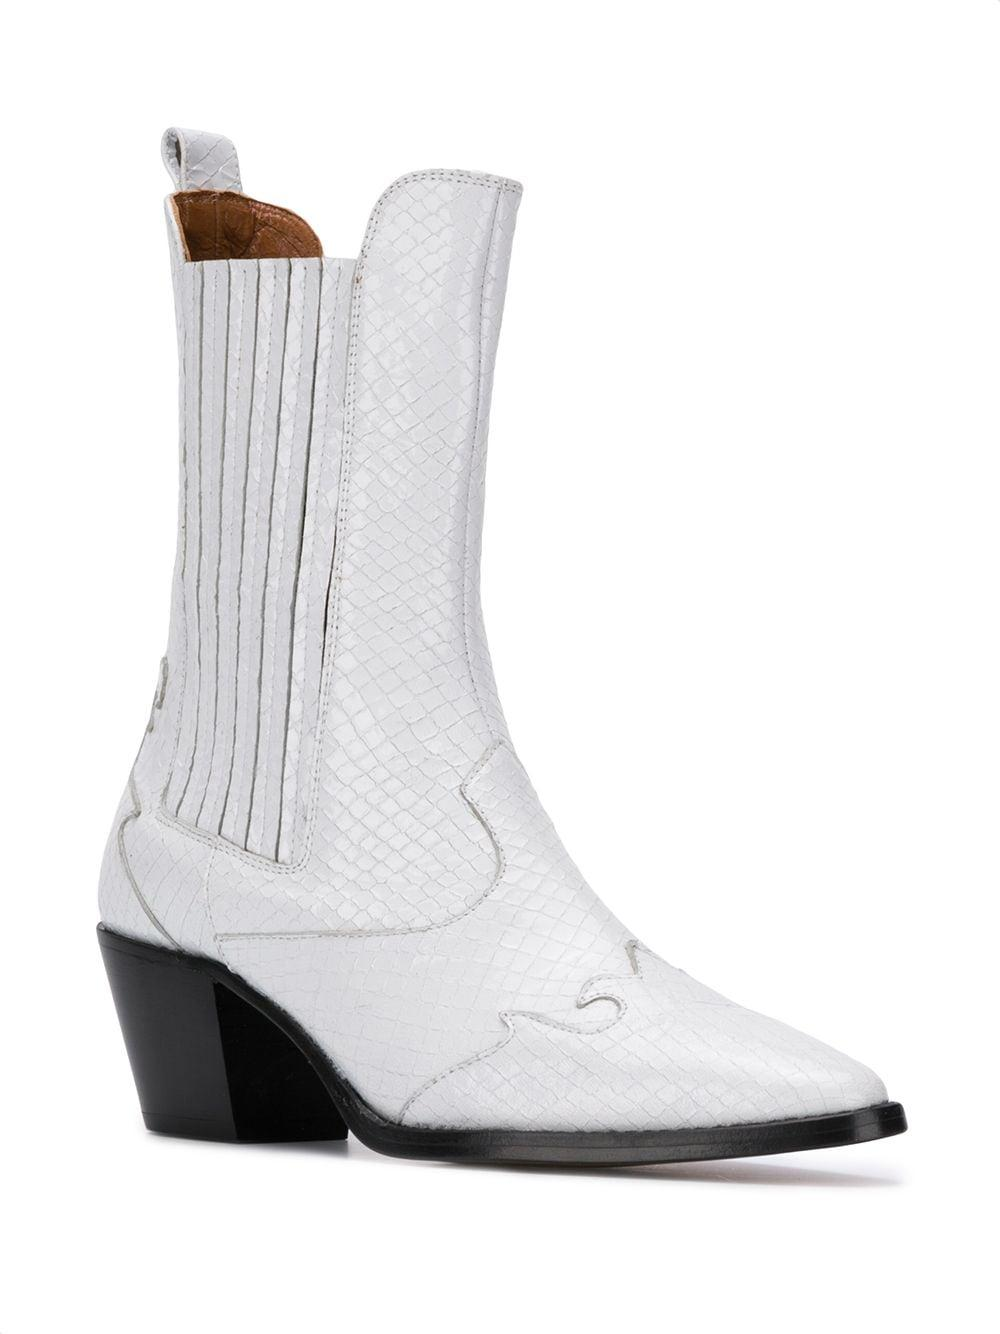 PX173S WHITE Calf Leather Paris Texas